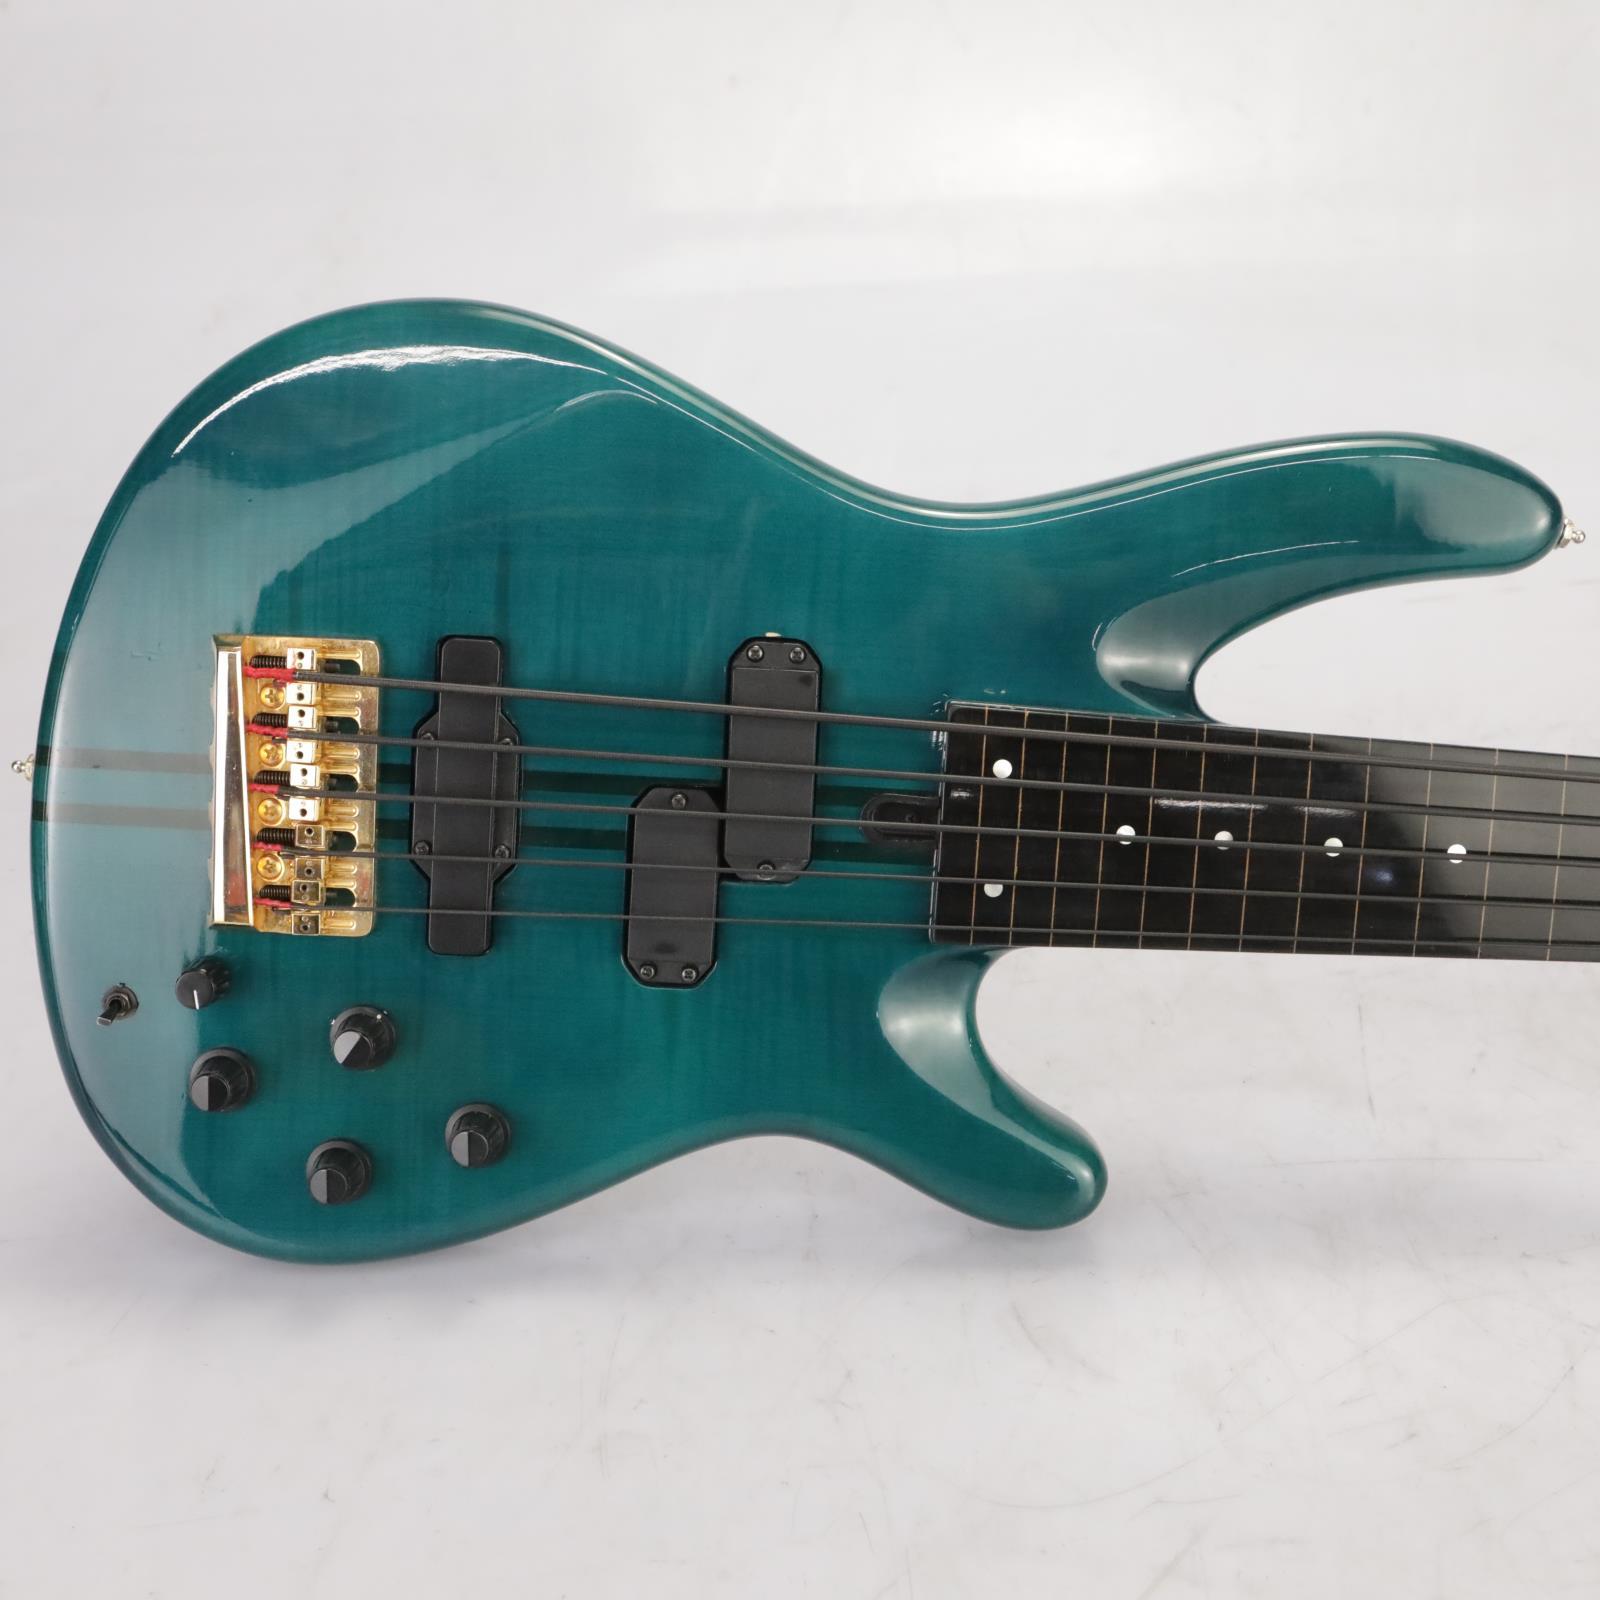 Yamaha TRB-5P 5 String Fretless  Bass Guitar Japan Owned by Leland Sklar #38836